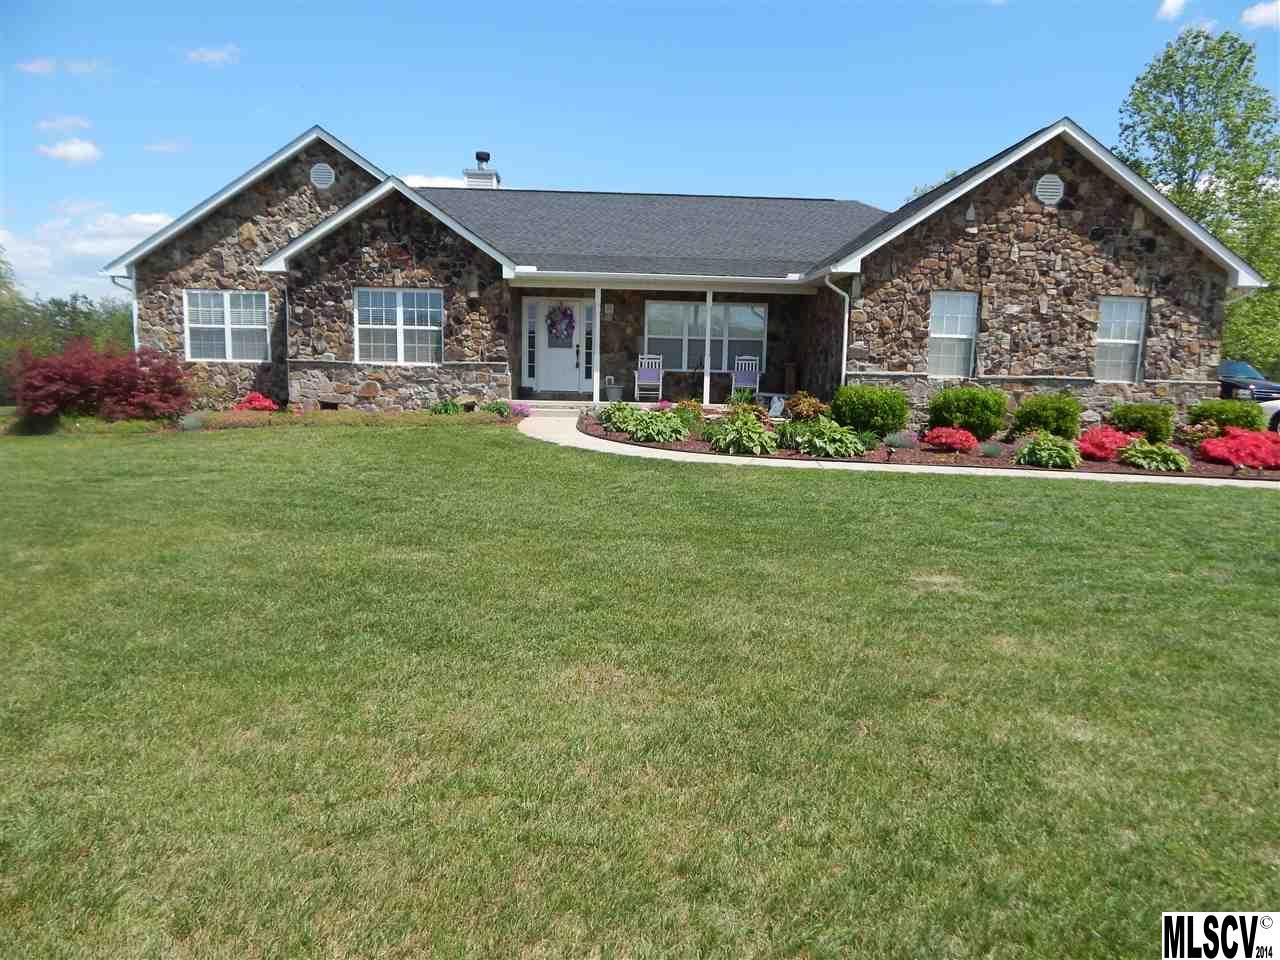 Real Estate for Sale, ListingId: 31525338, Claremont,NC28610